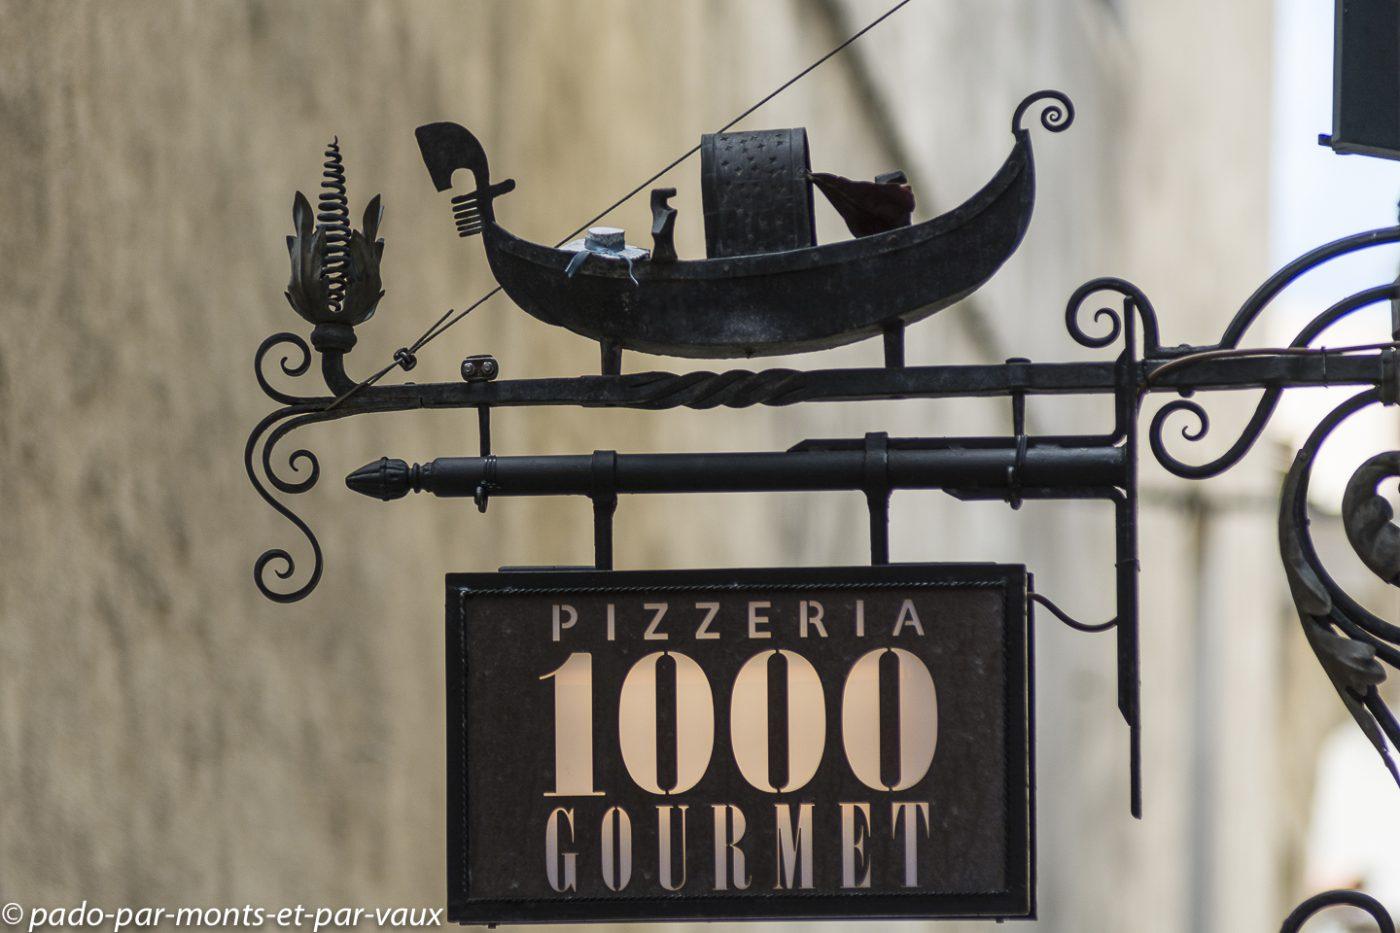 Venise -  Pizzeria 1000 Gourmet